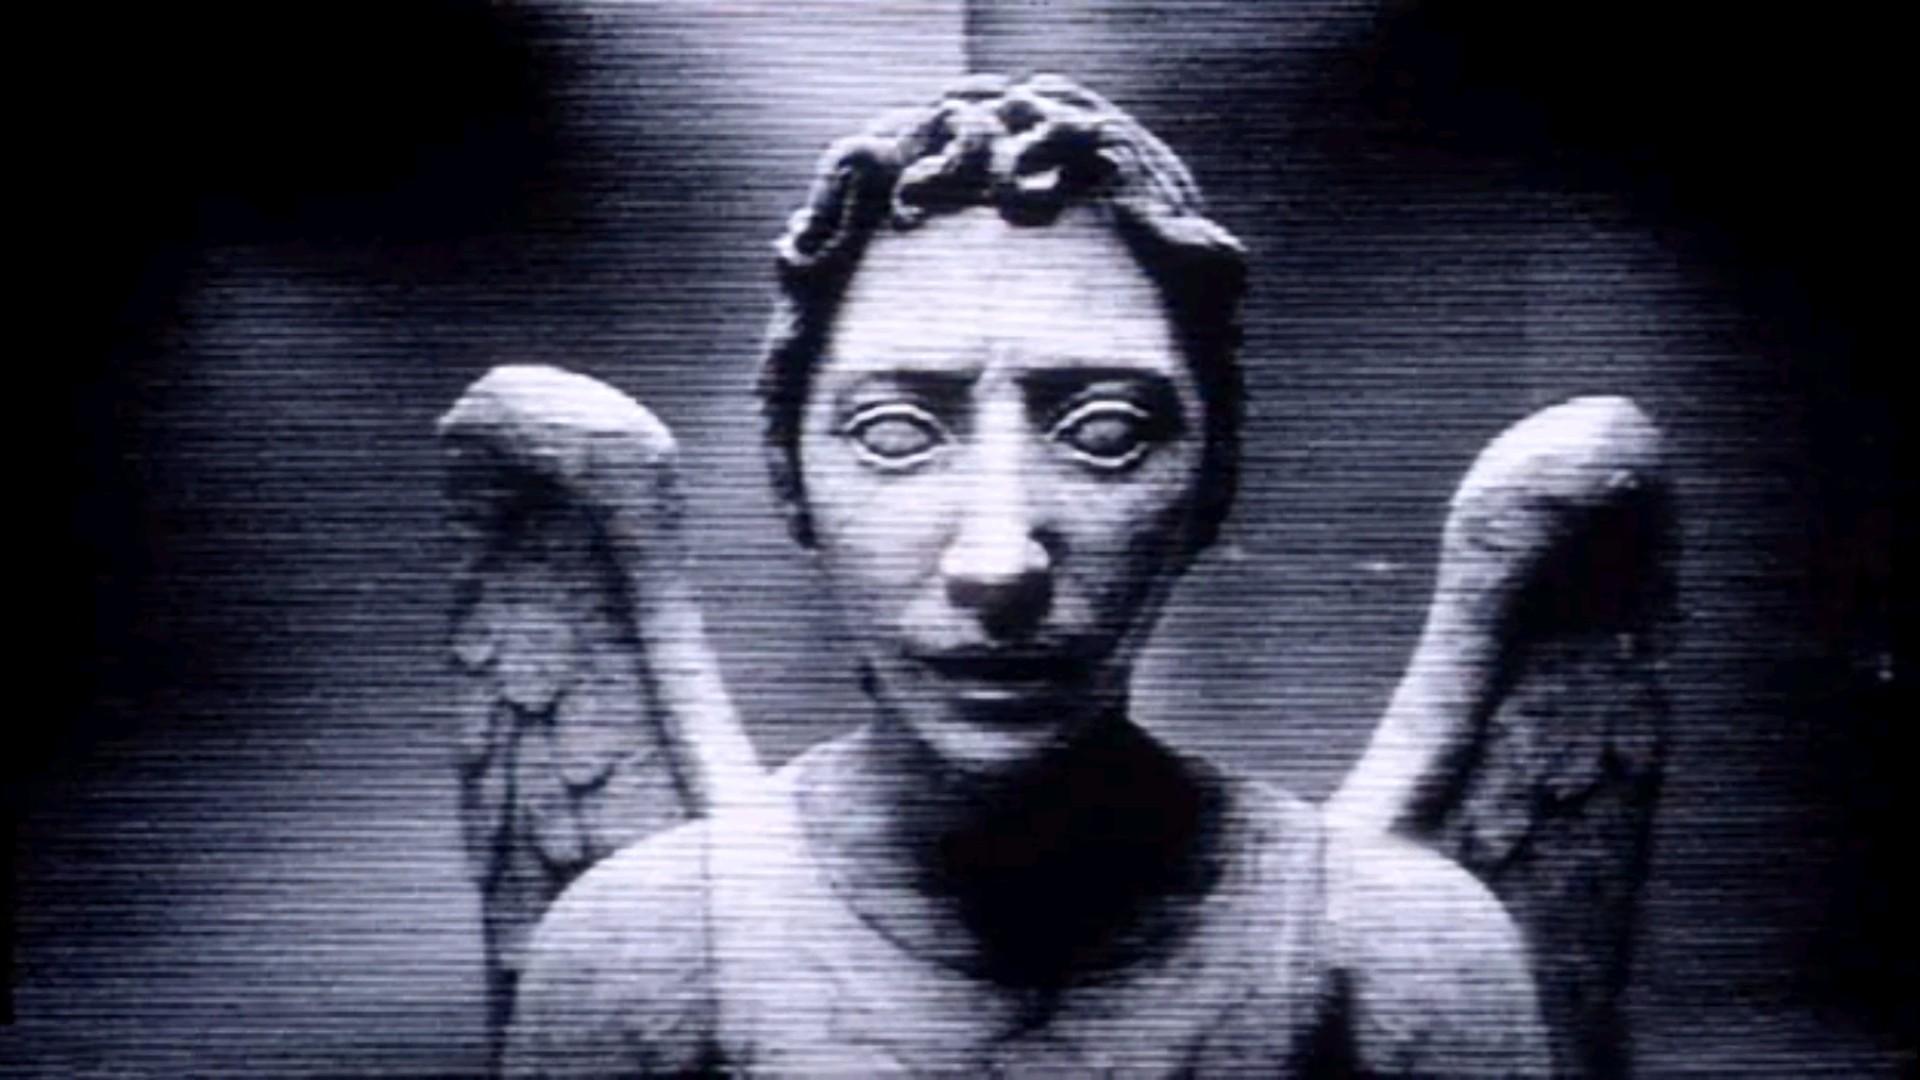 Fondos De Pantalla 1920x1080 Px Angel Angeles Oscuro Demonio